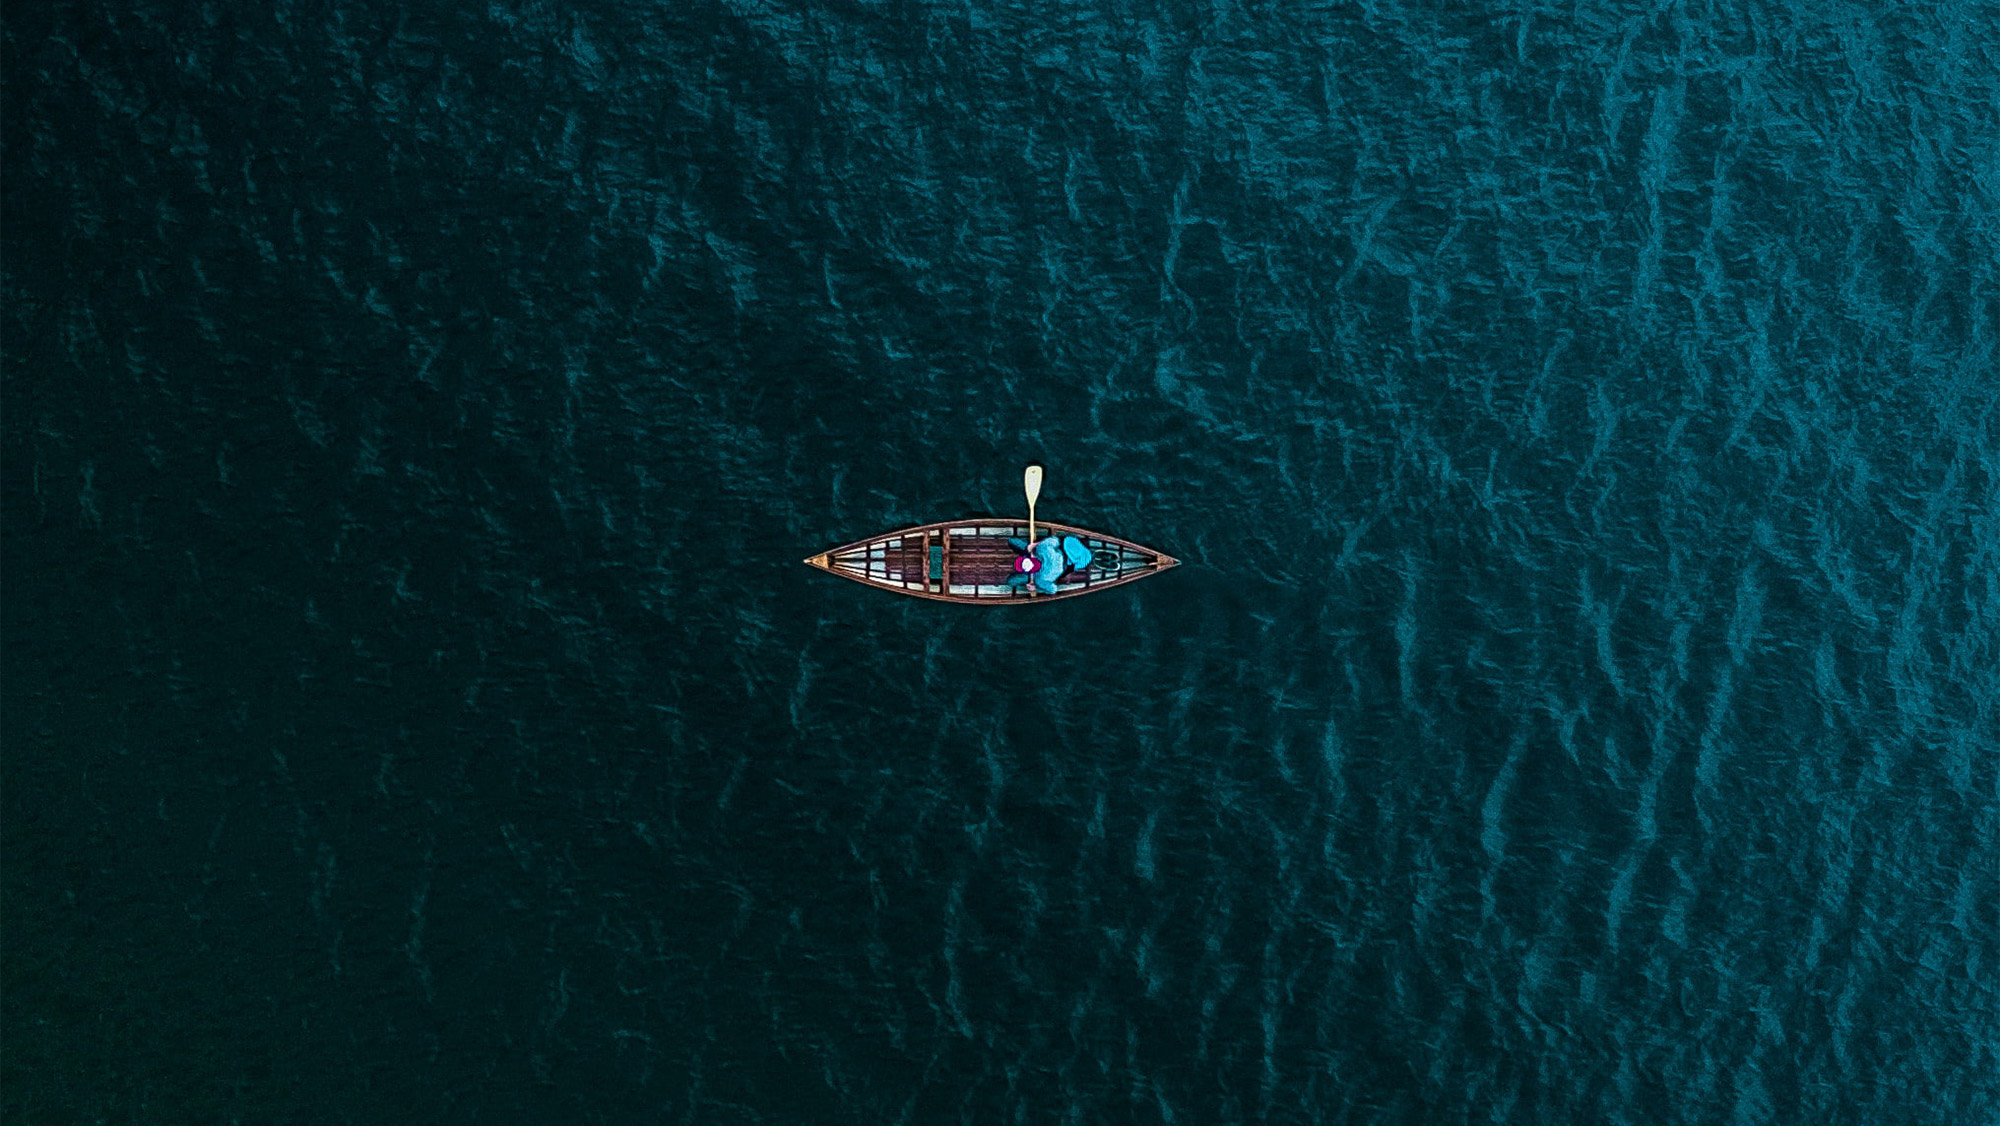 A man kayaking across the ocean.